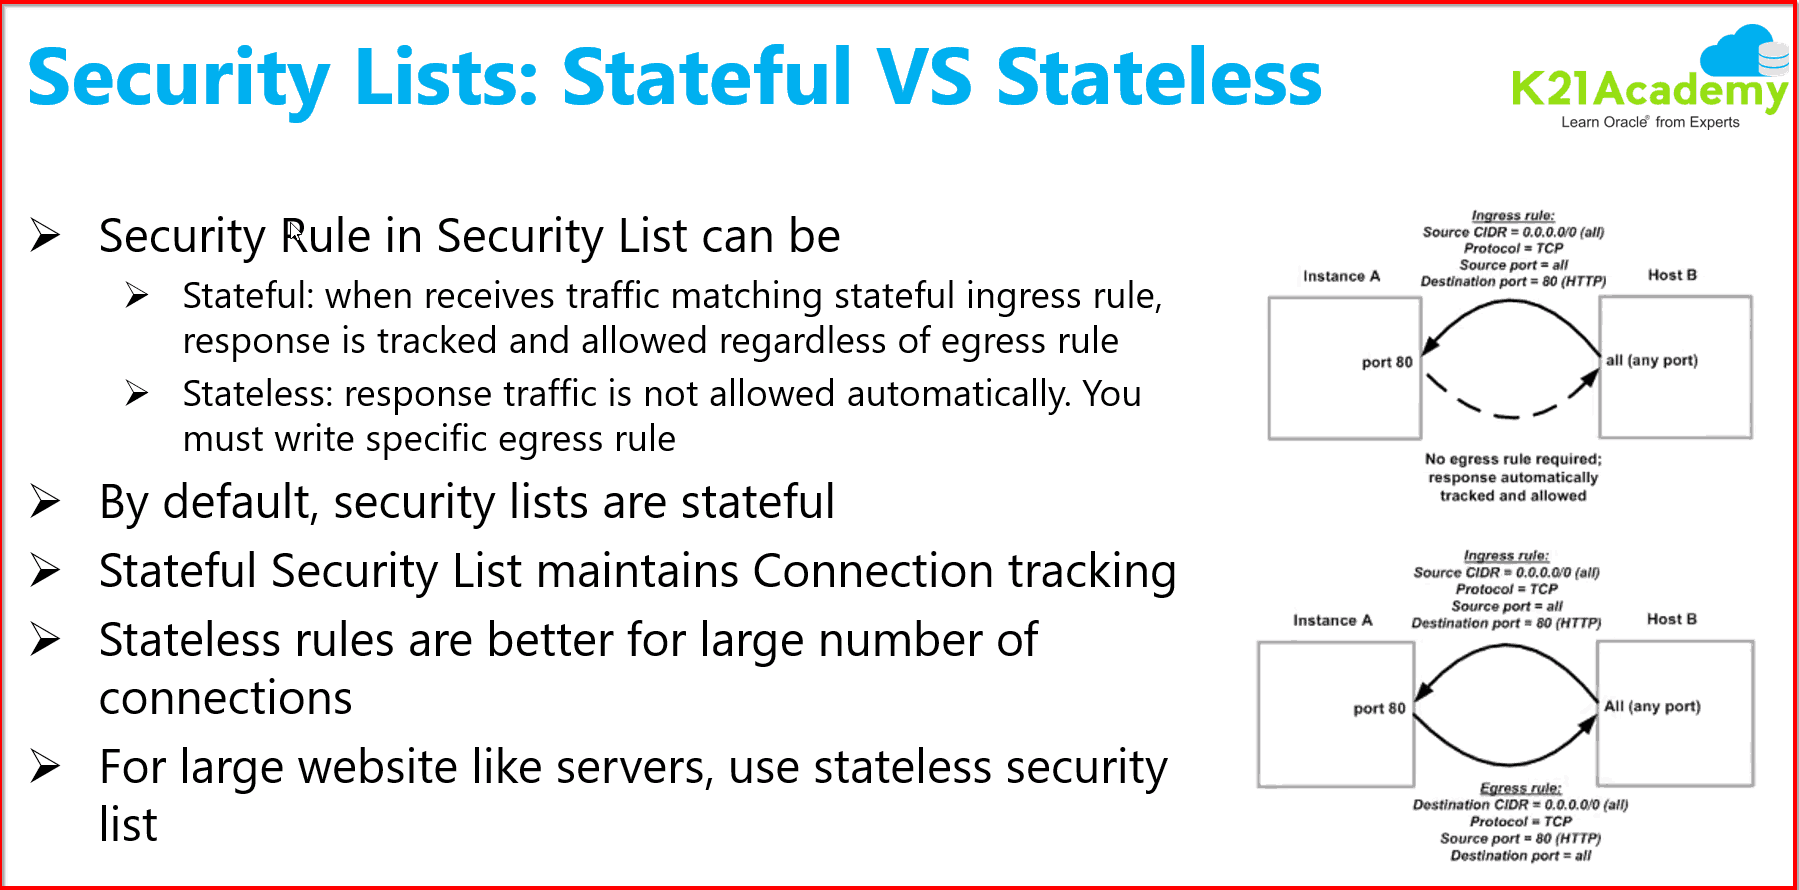 Security list: Stateful & Stateless